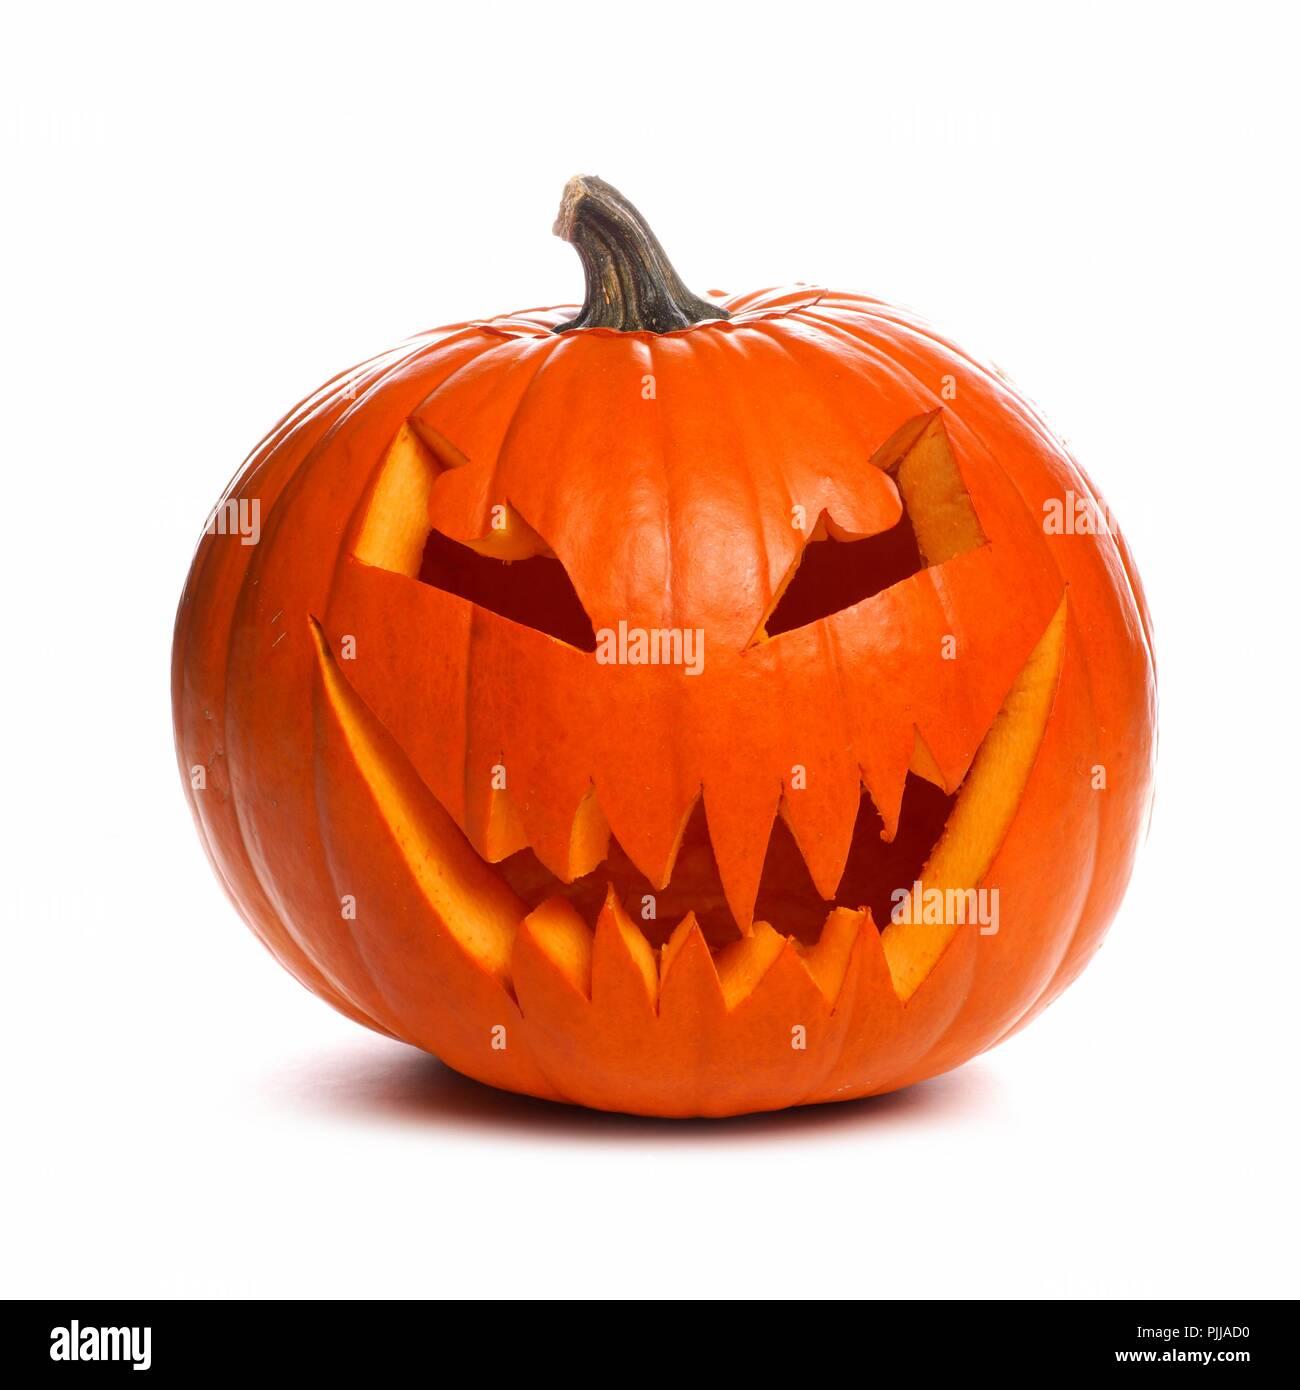 Spooky Halloween Jack o Lantern isolated on a white background - Stock Image